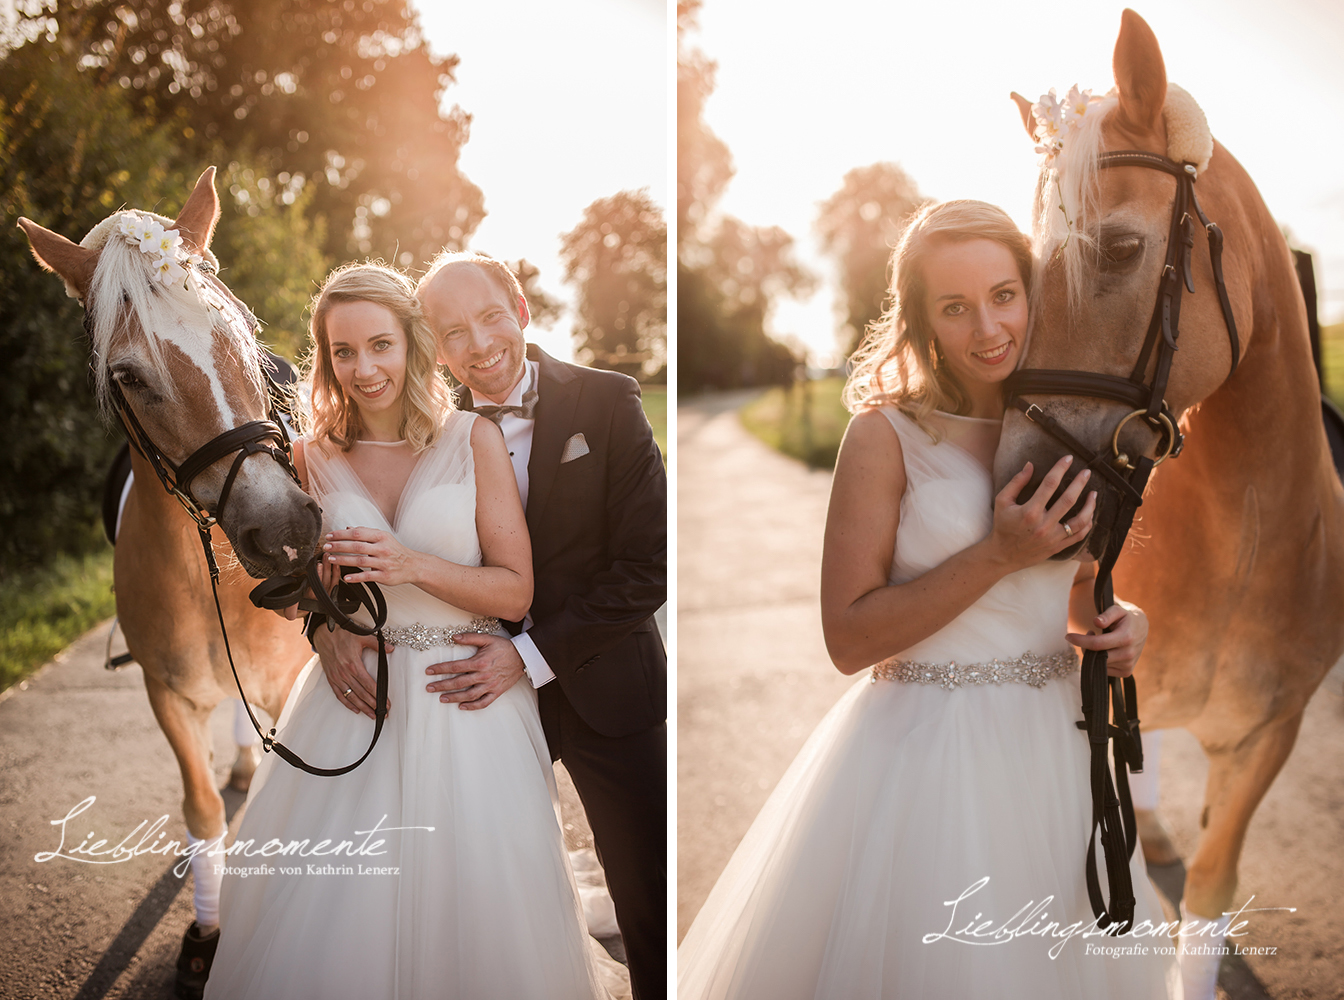 Hochzeit_pferd_ratingen_duesseldorf_fotograf (8)